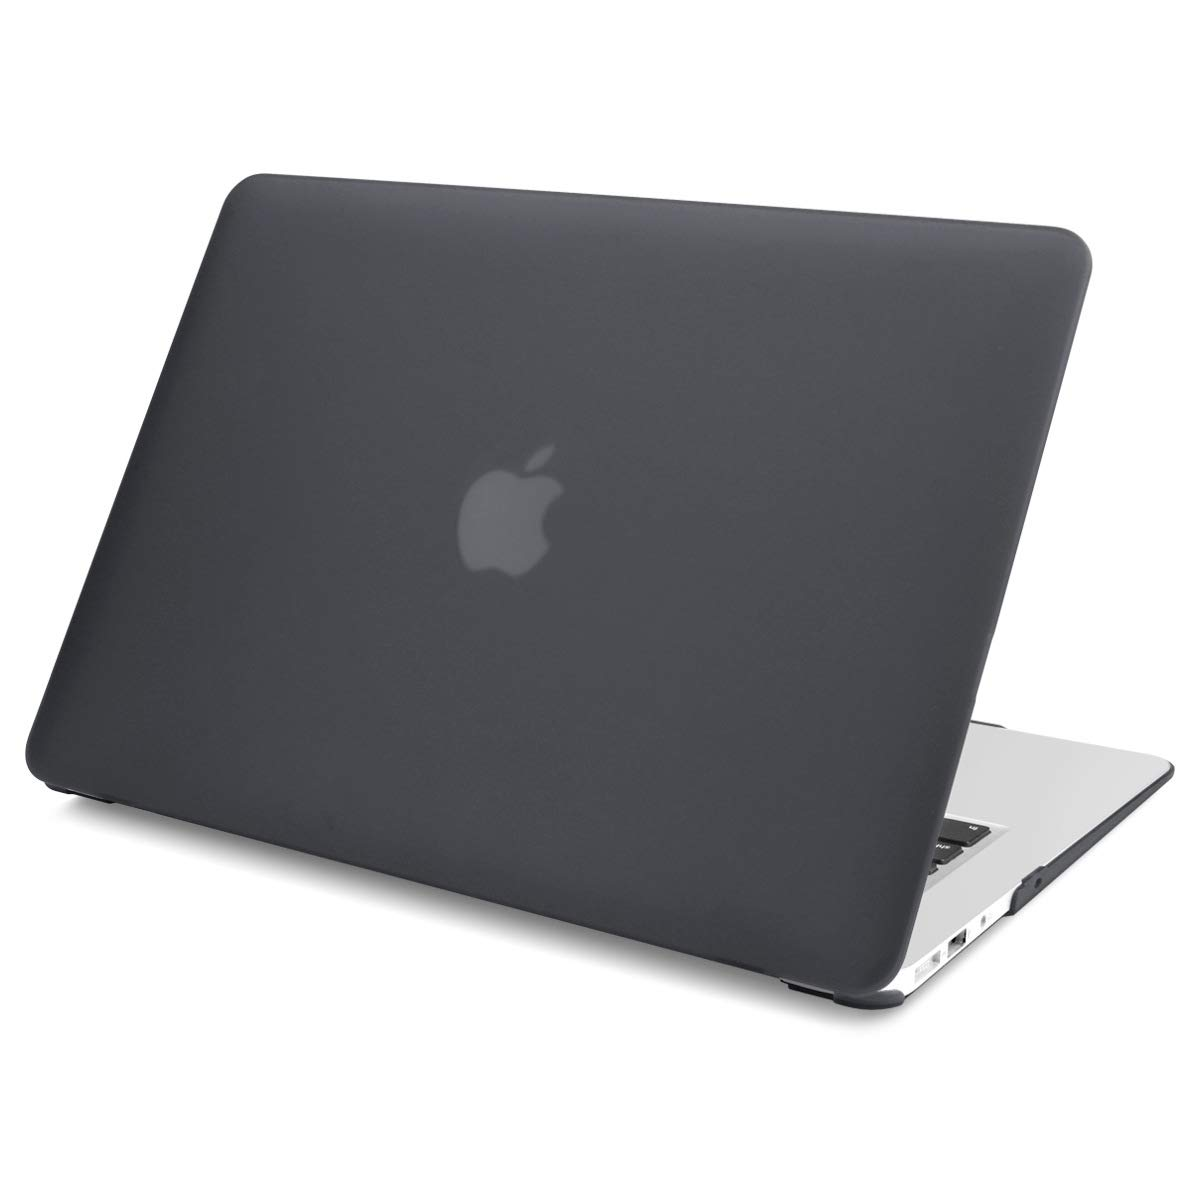 Batianda Funda Dura MacBook Pro Retina 13 Pulgadas A1425 / A1502 Carcasa Case (2012/2013/2014/2015 Versión)(Negro Mate)